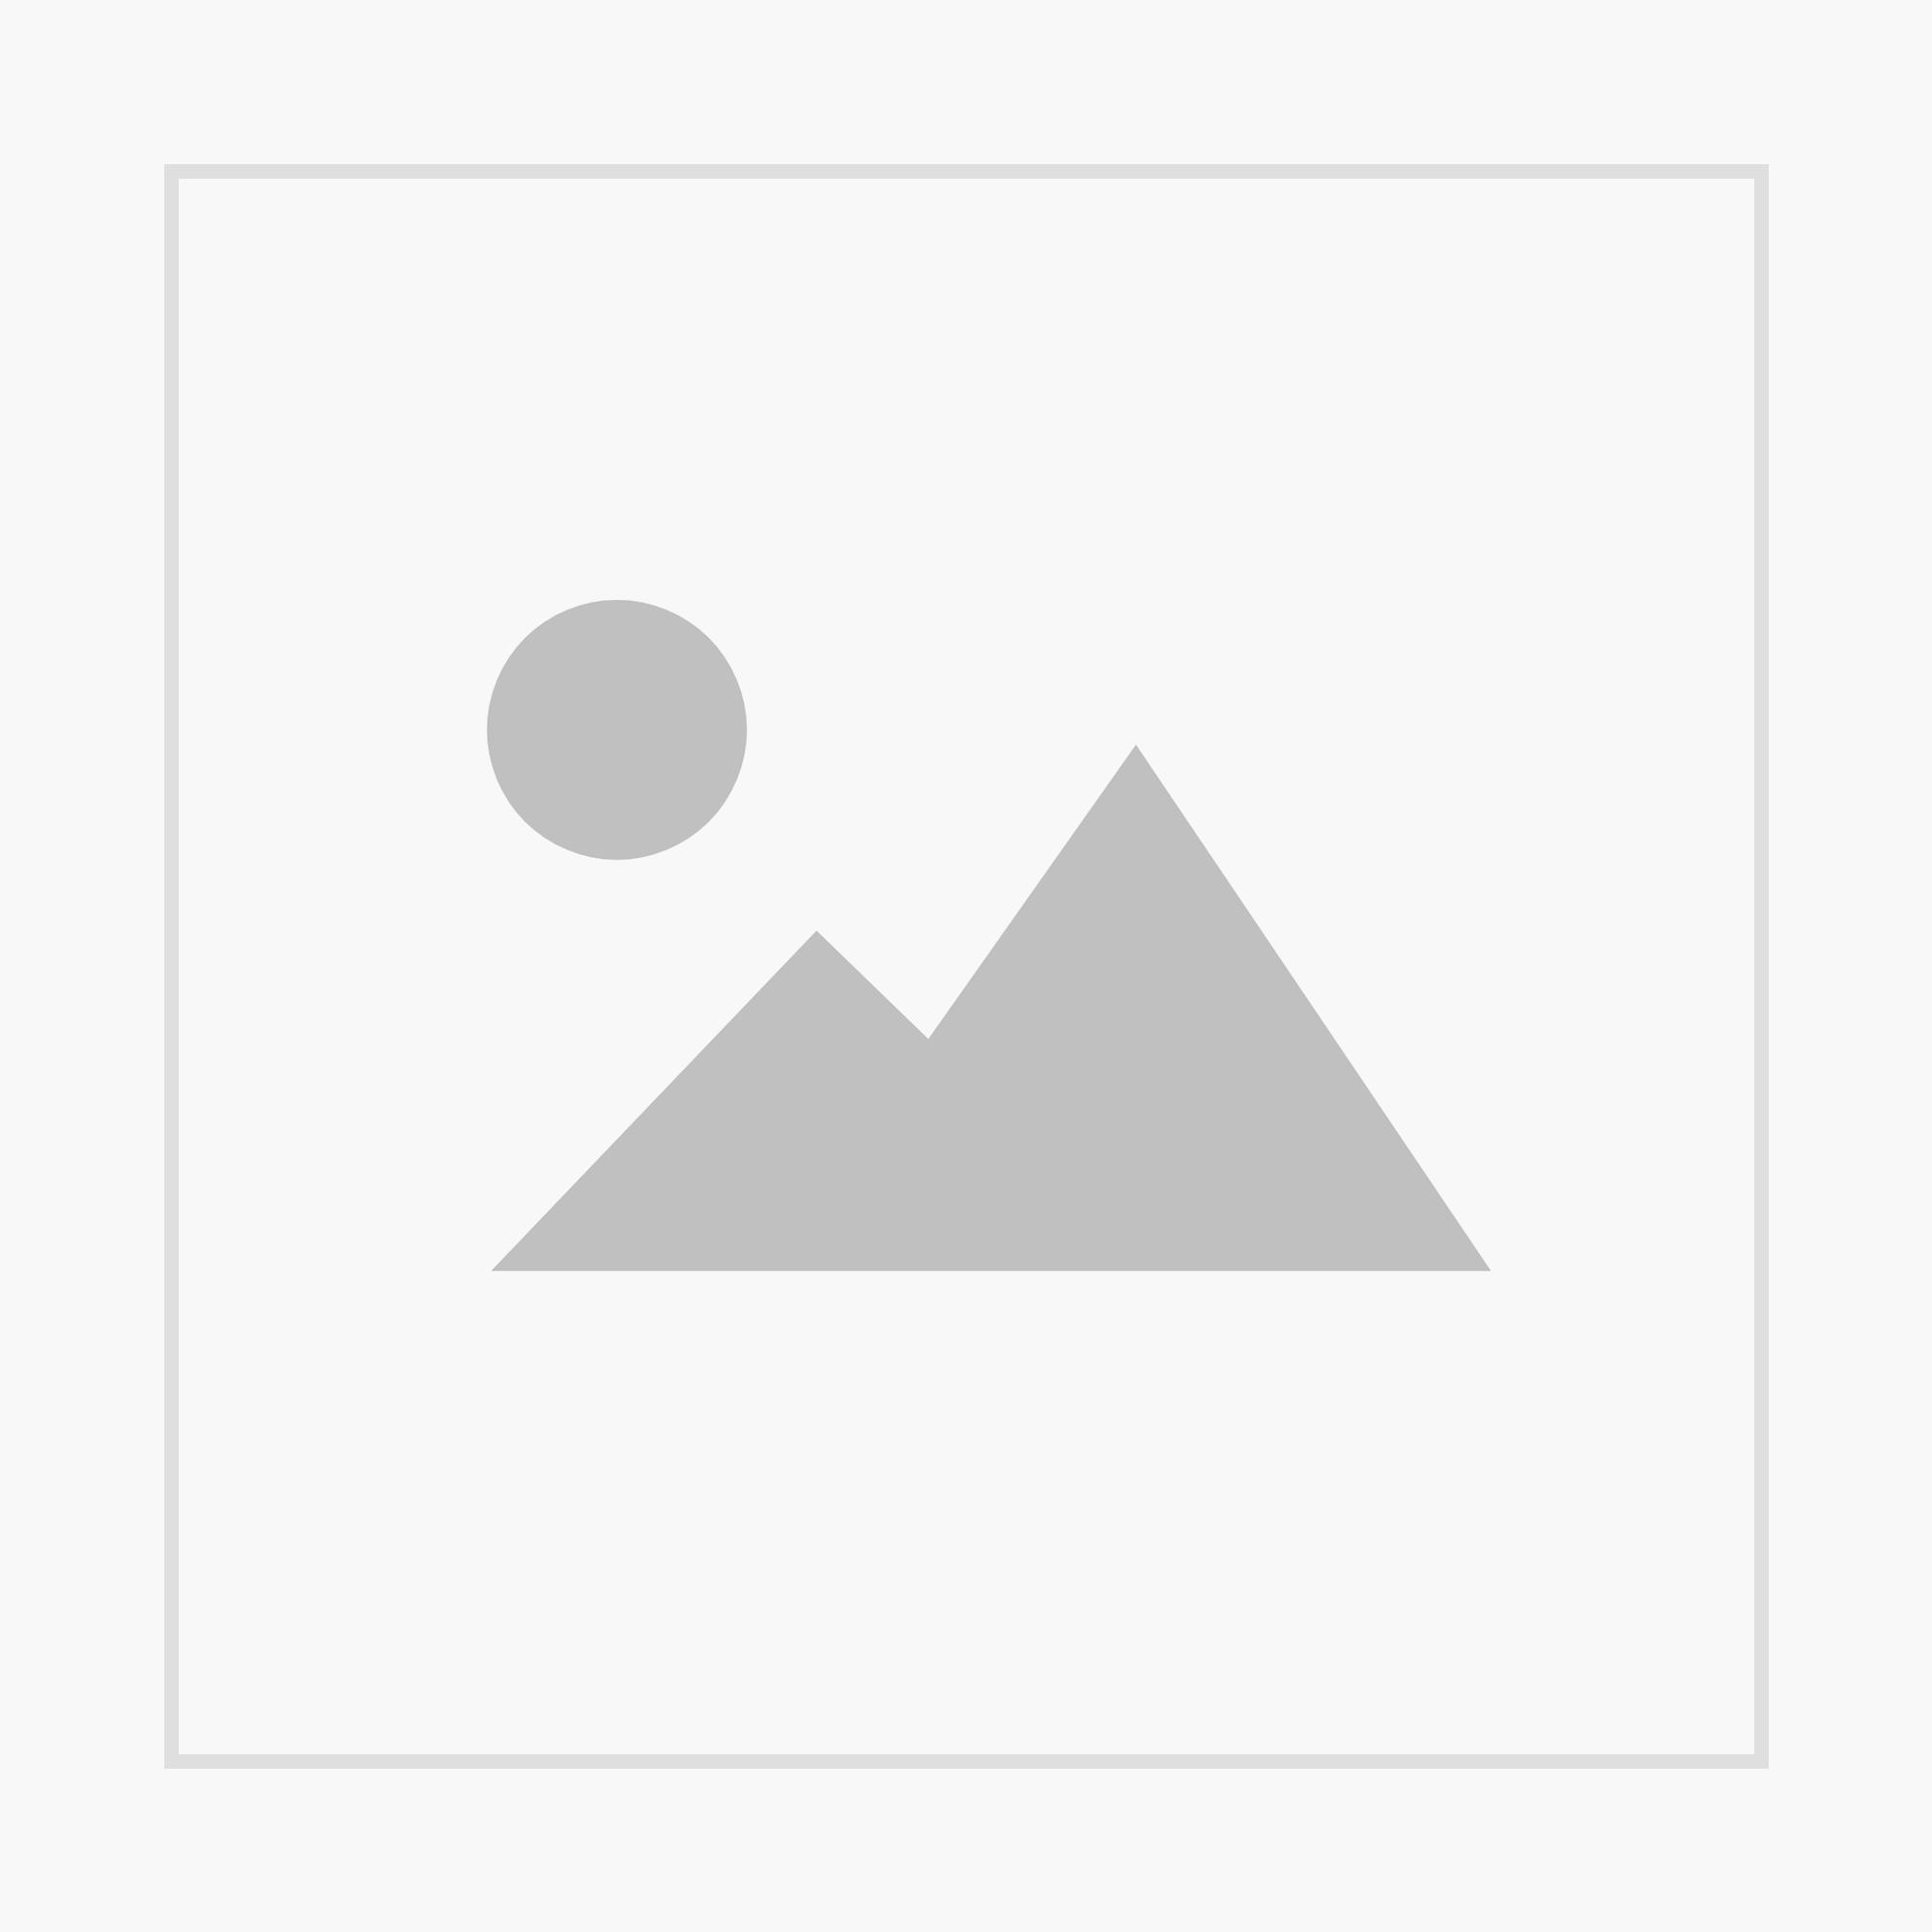 Living at Home Spezial 09/2012 - Gäste & Feste